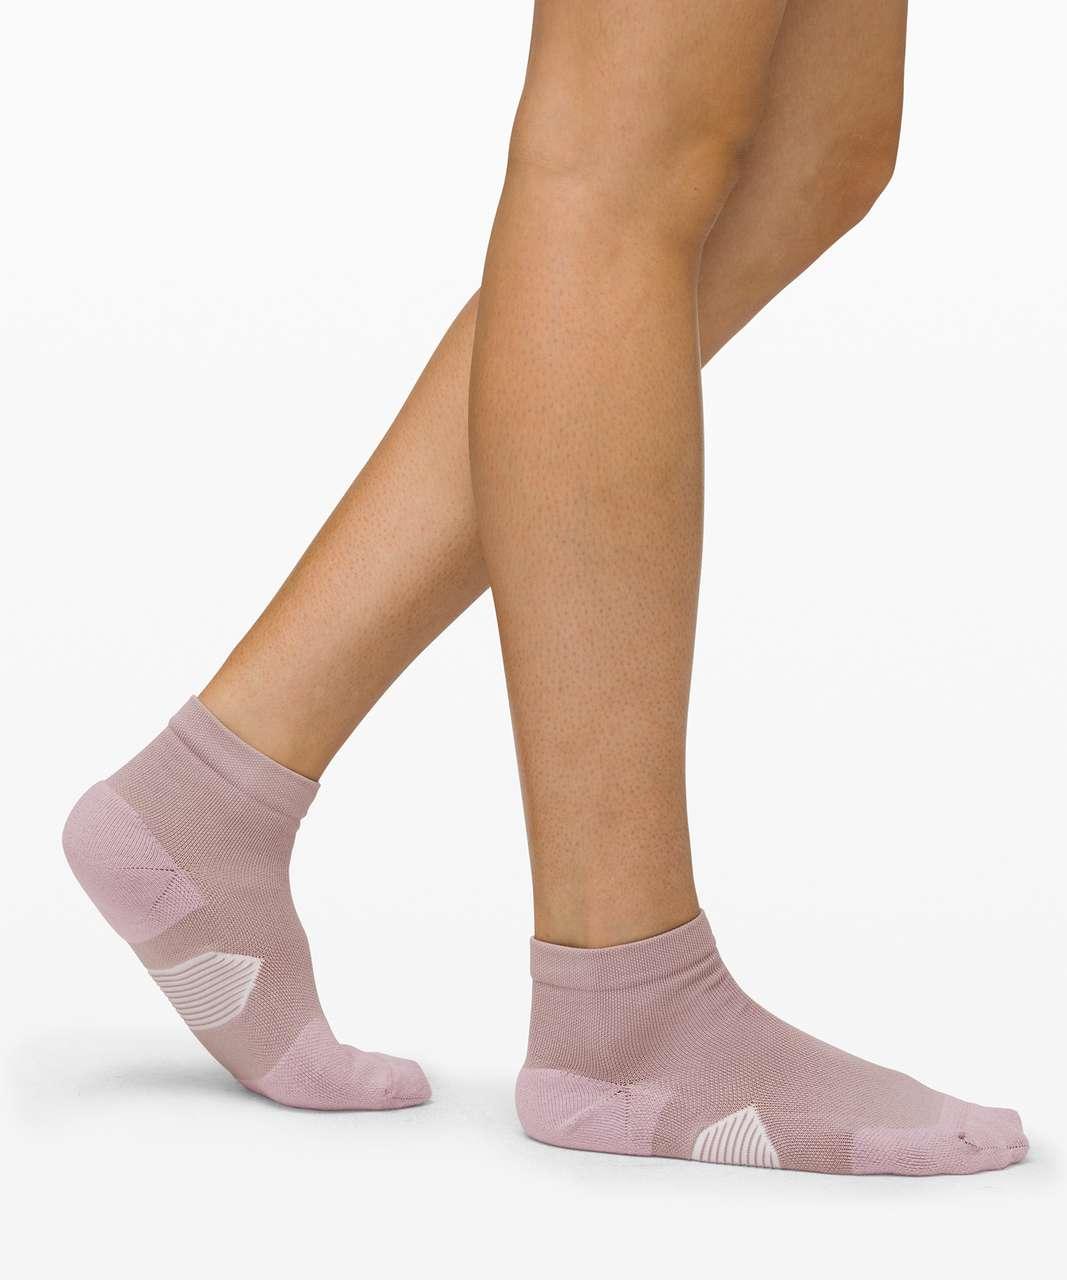 Lululemon Speed Ankle Sock *Silver - Smoky Blush / White